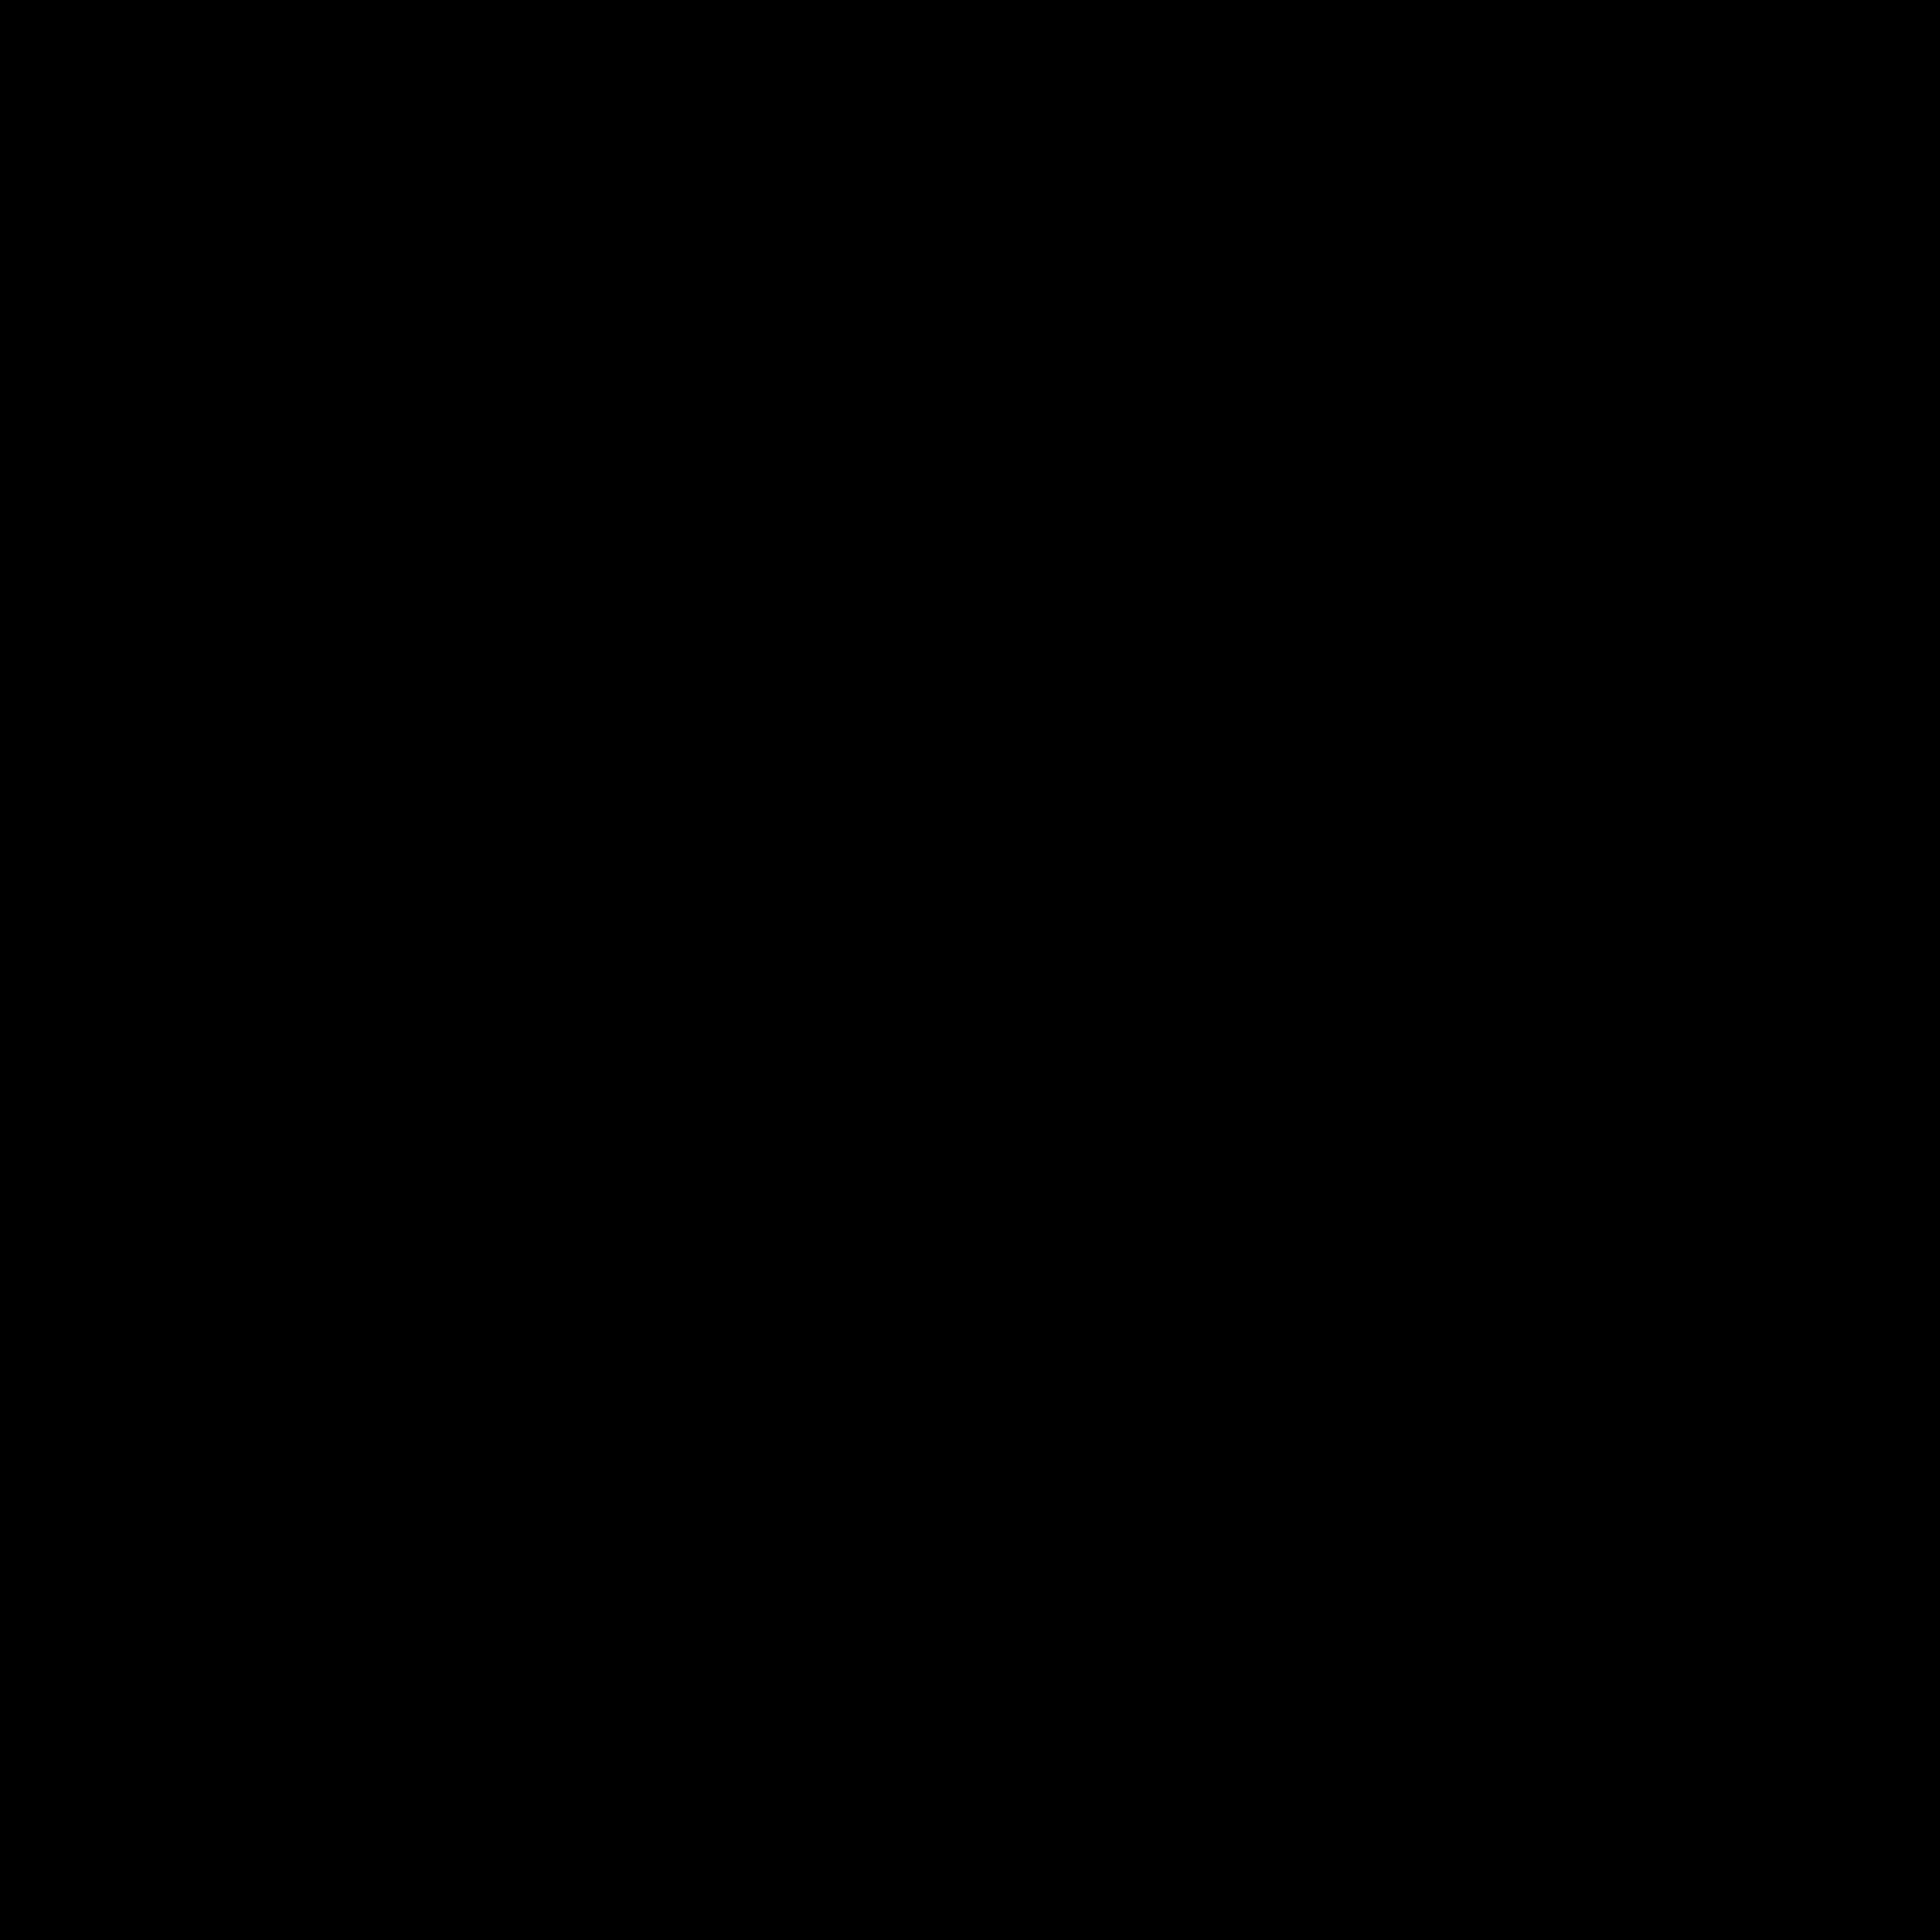 size 40 best price promo code BDO Logo PNG Transparent & SVG Vector - Freebie Supply